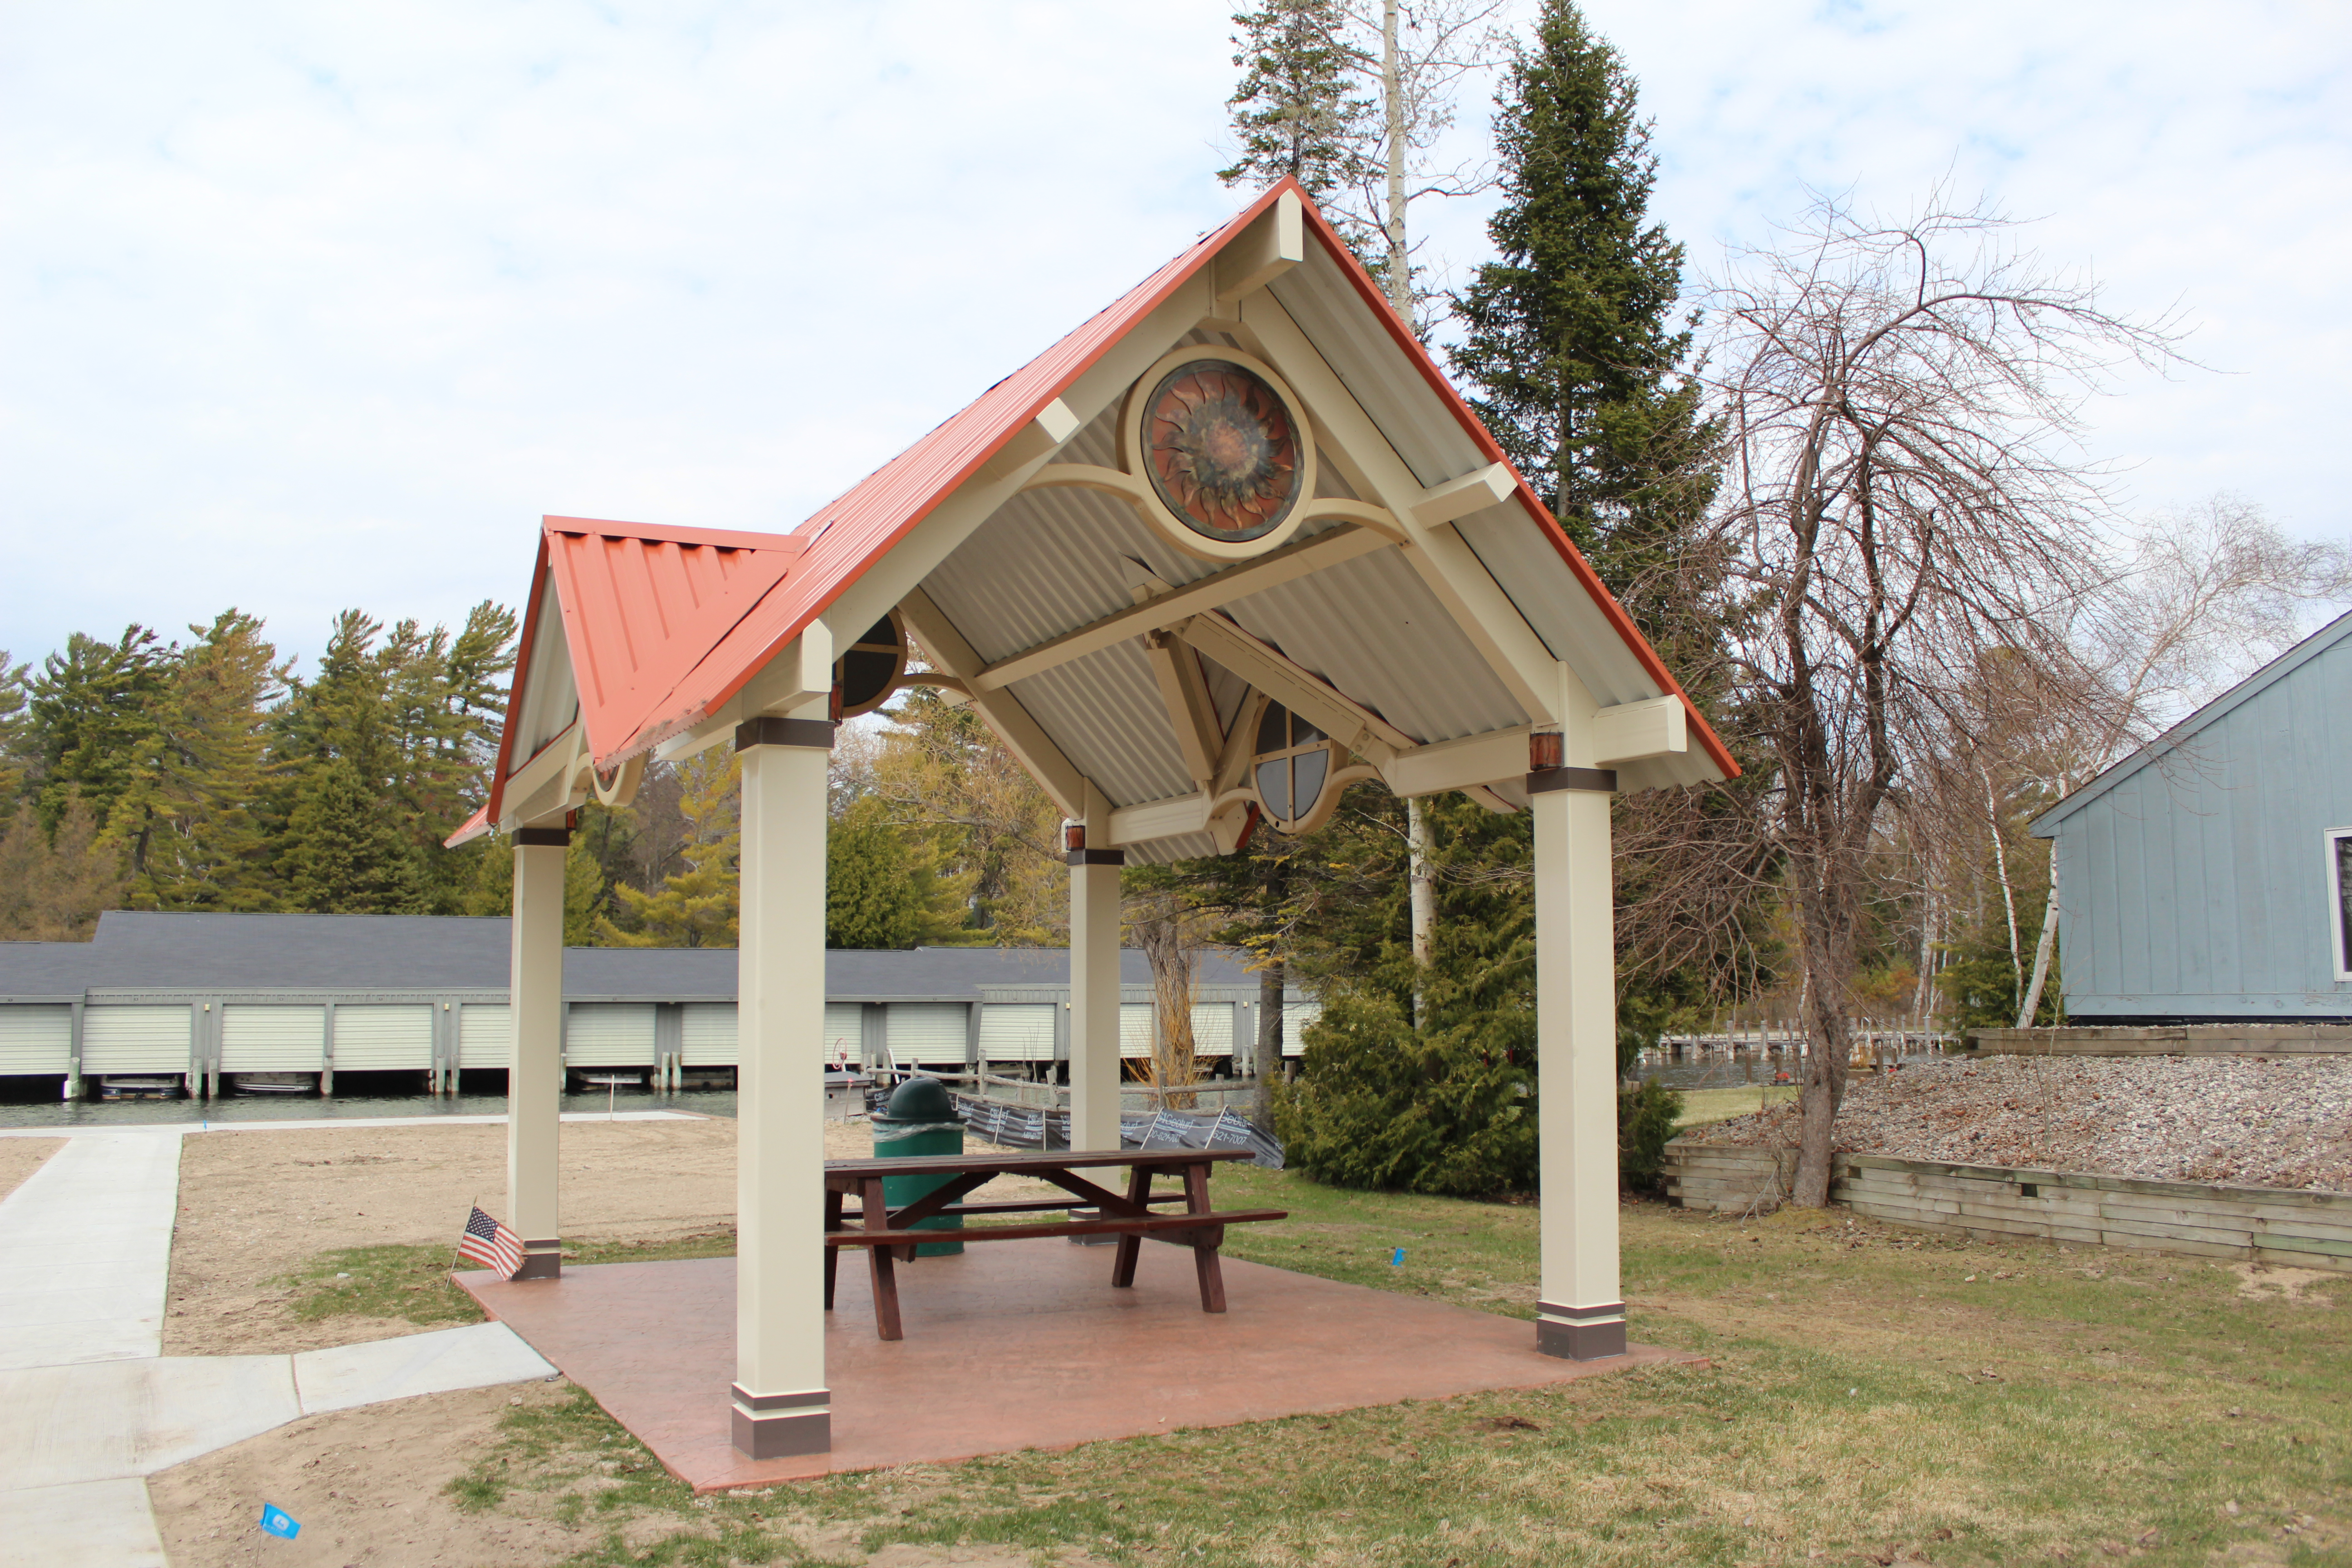 Tuscaroroa-county-parks-michigan-shelter